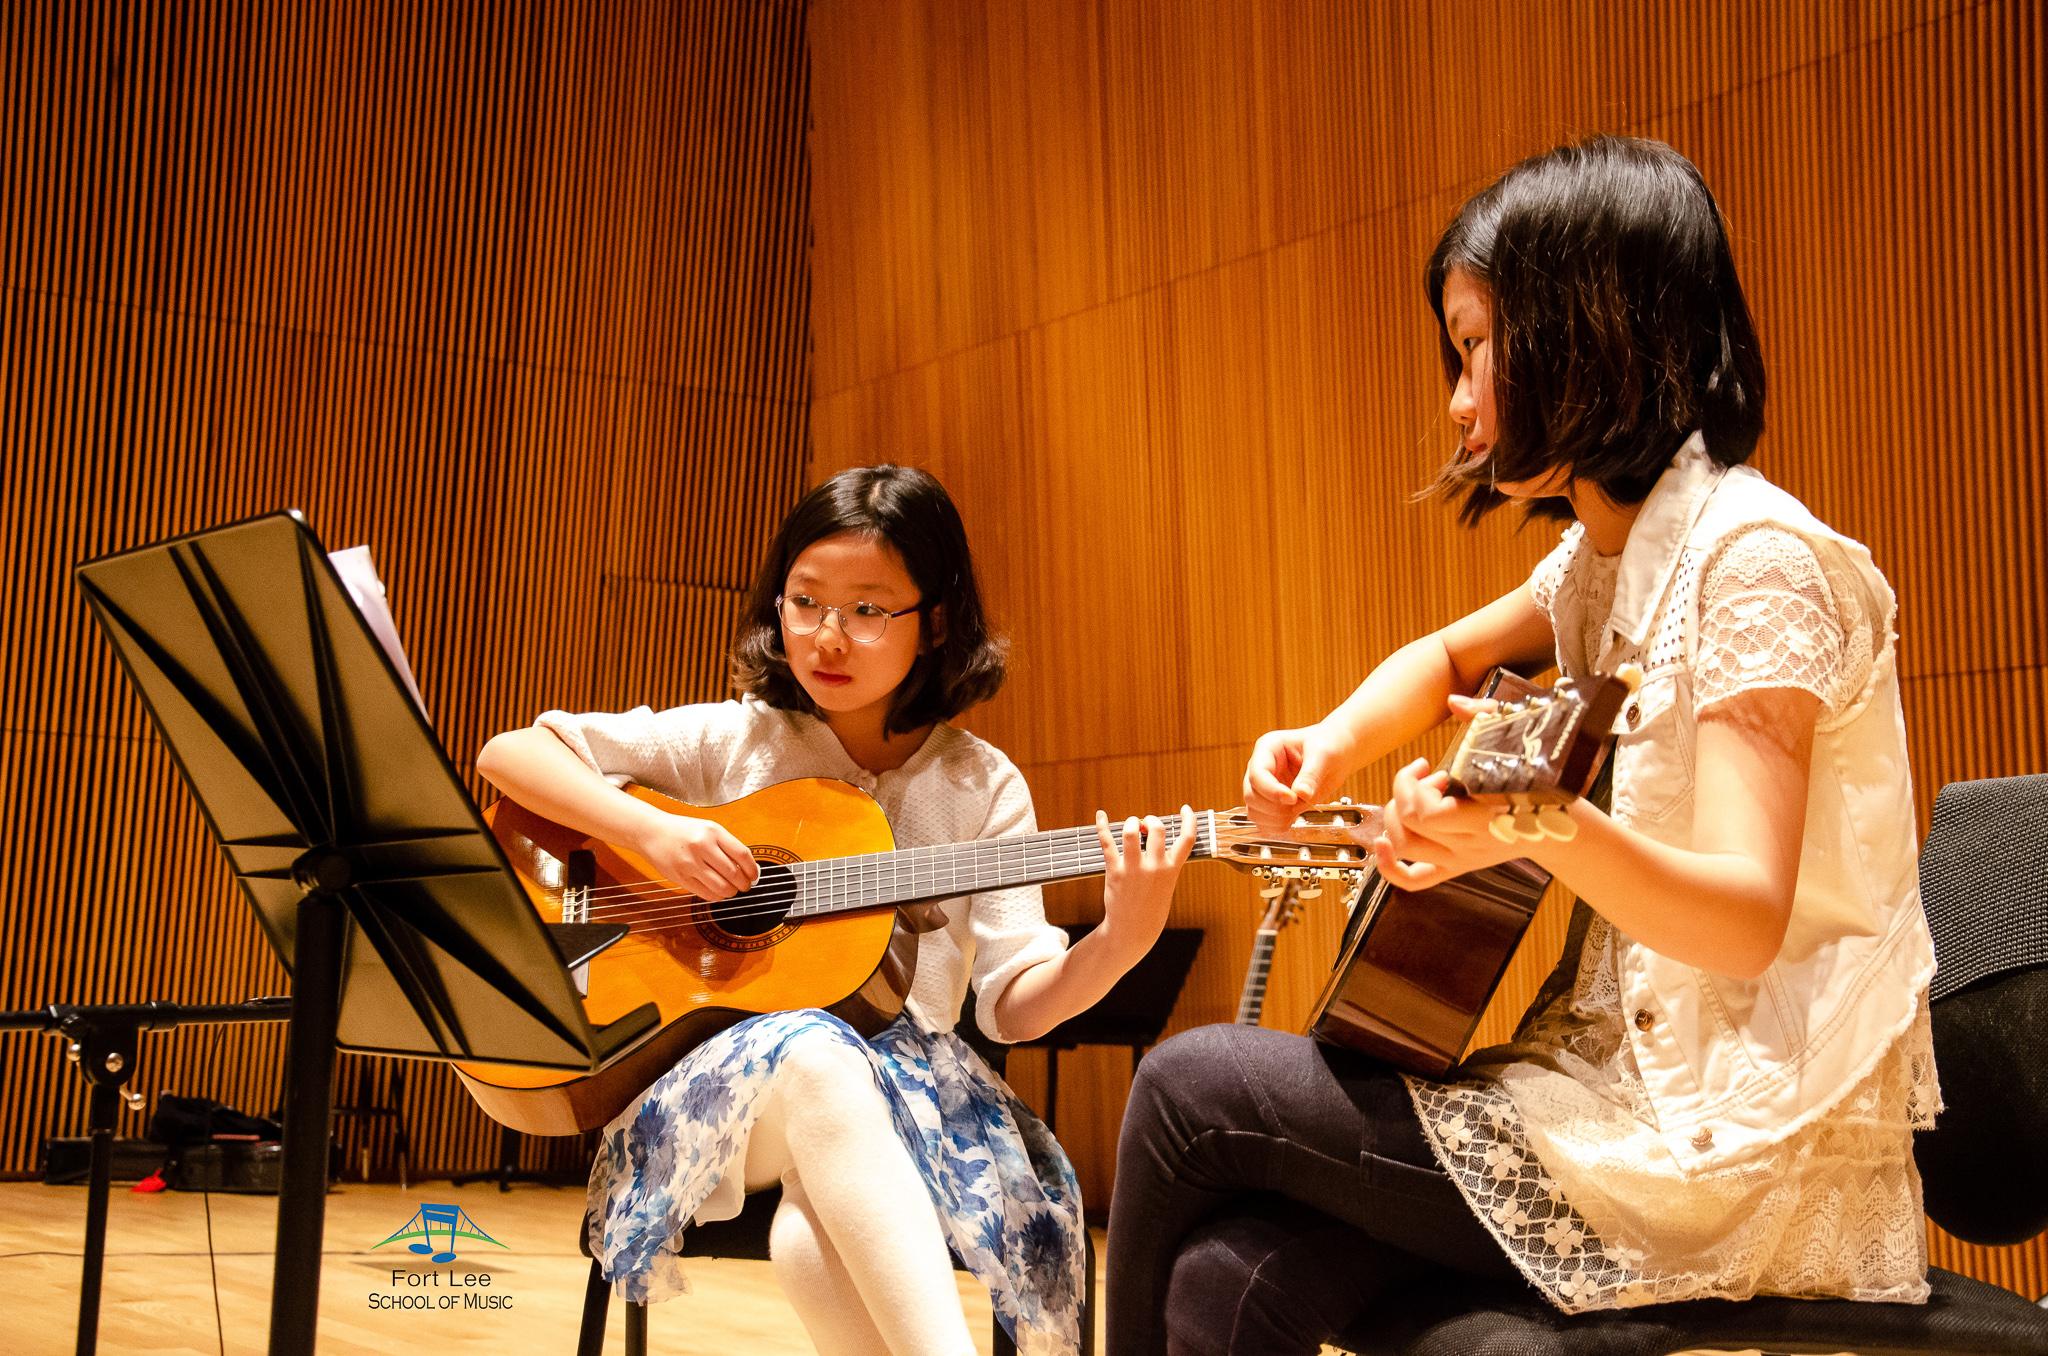 guitar-lessons-near-me.jpg